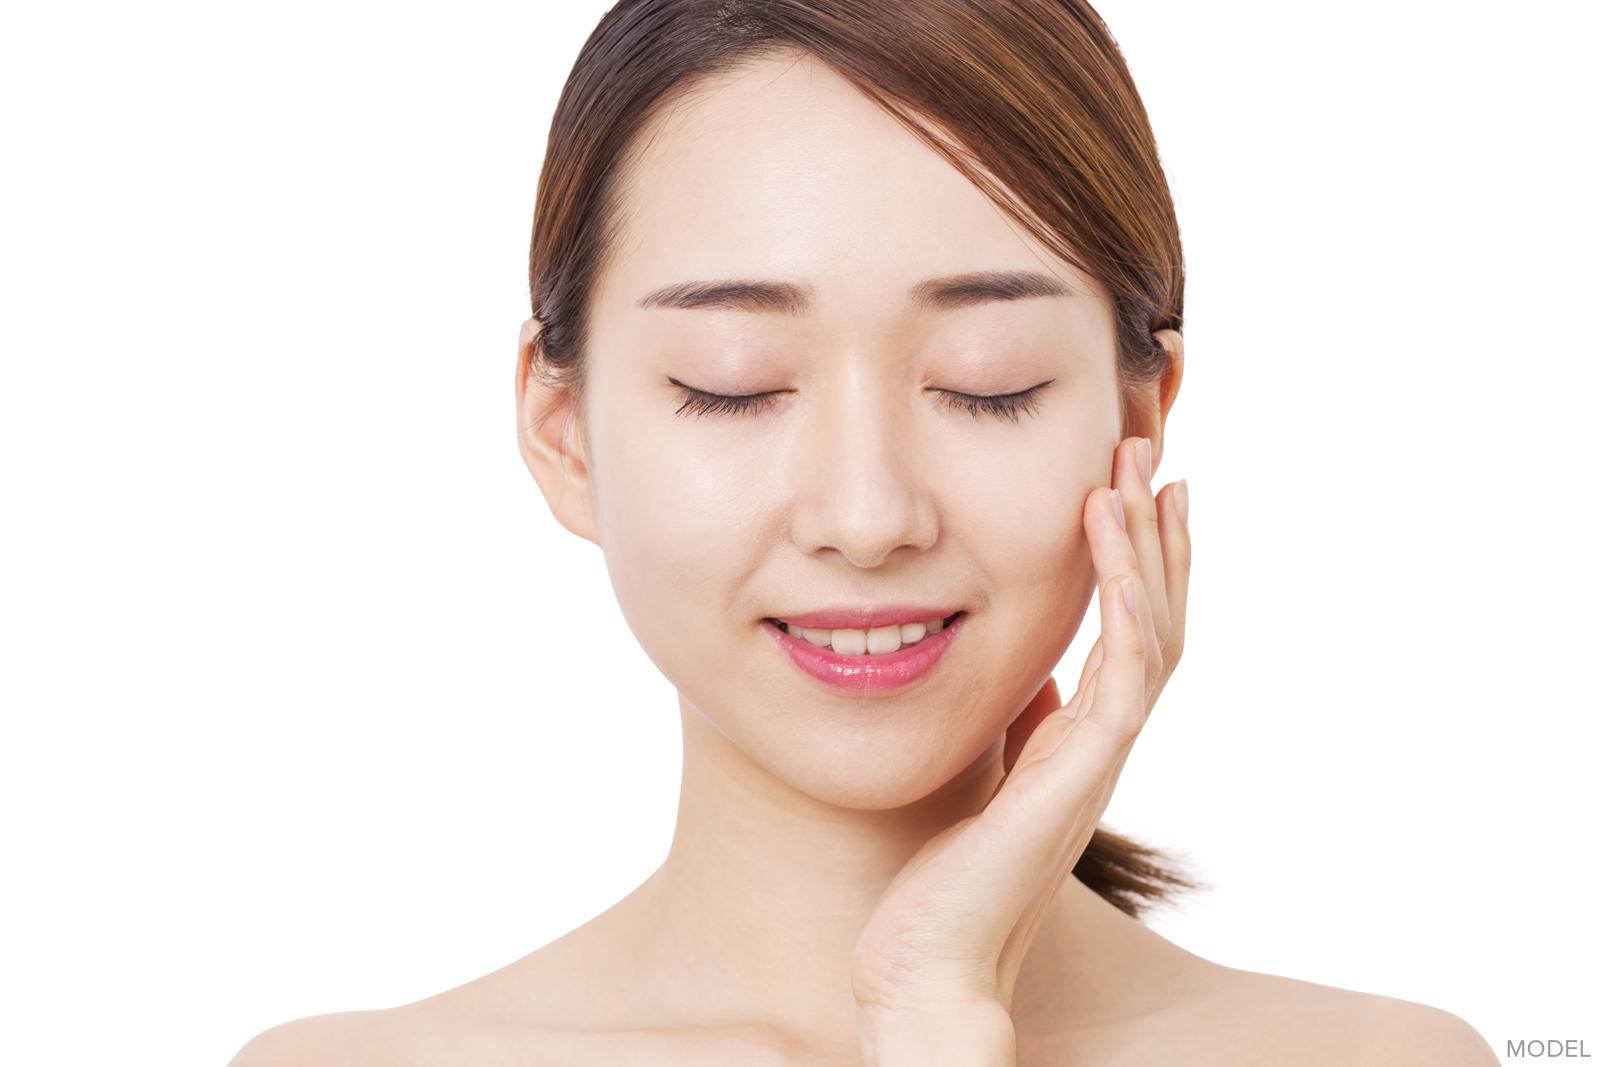 Woman closing eyes following eyelid surgery